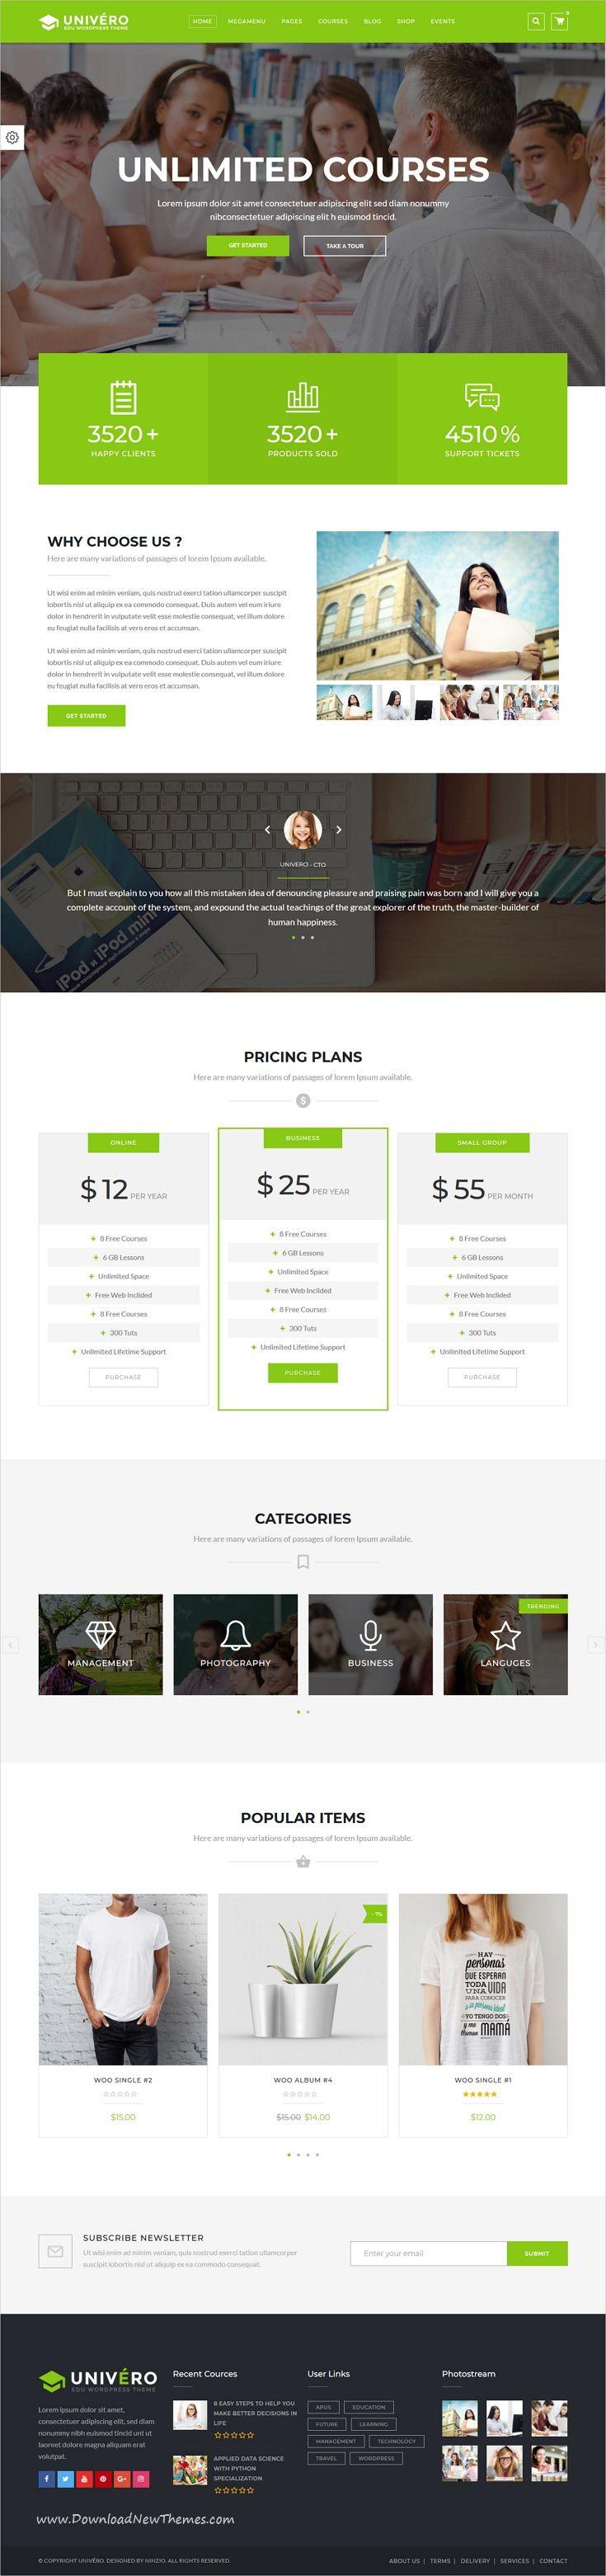 Univero Is Clean And Modern Design 10in1 Responsive Wordpresstheme